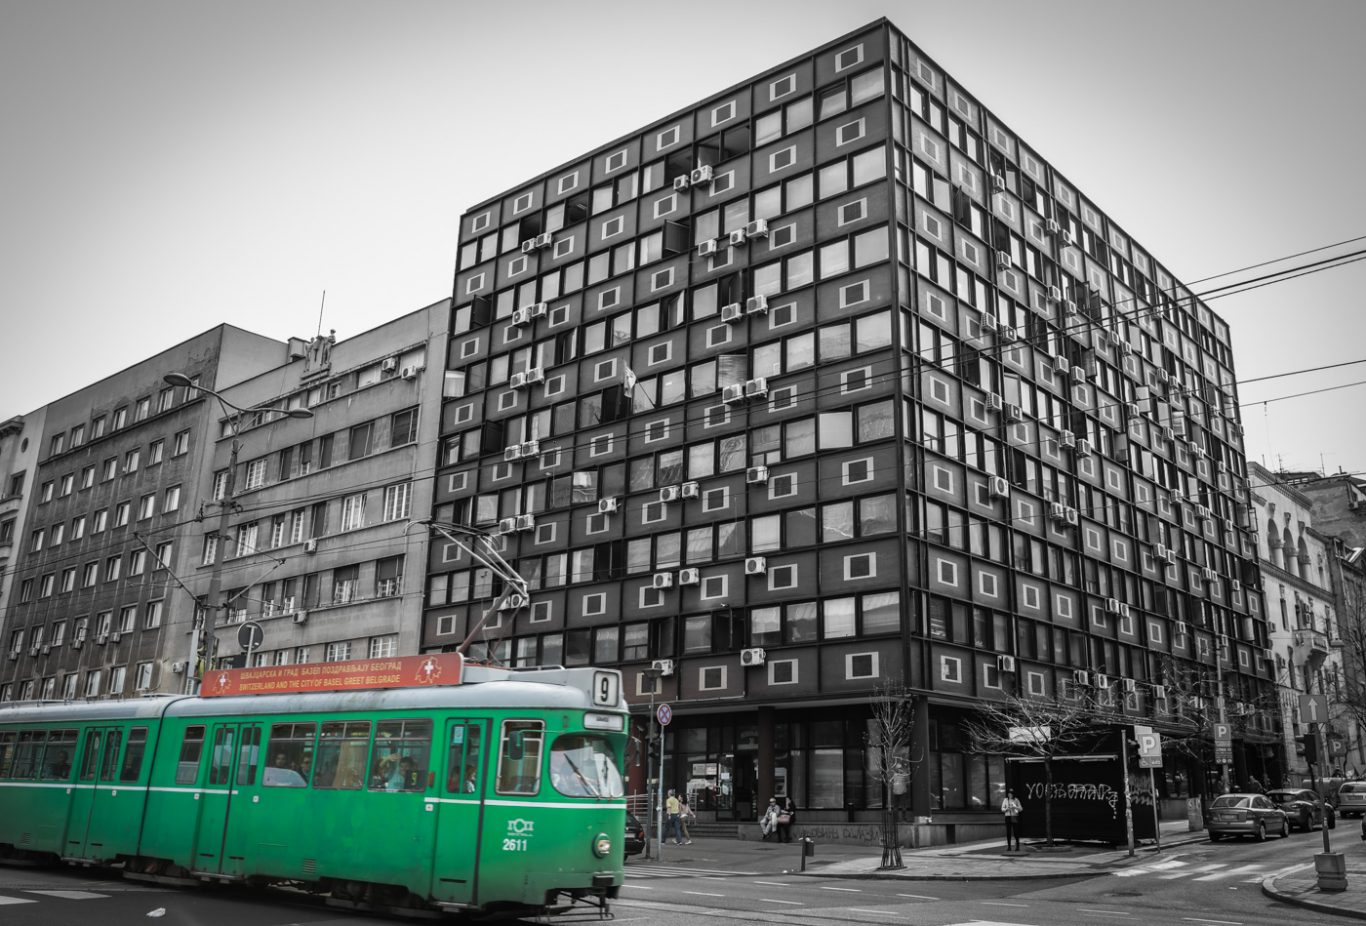 Tram in Belgrade Serbia